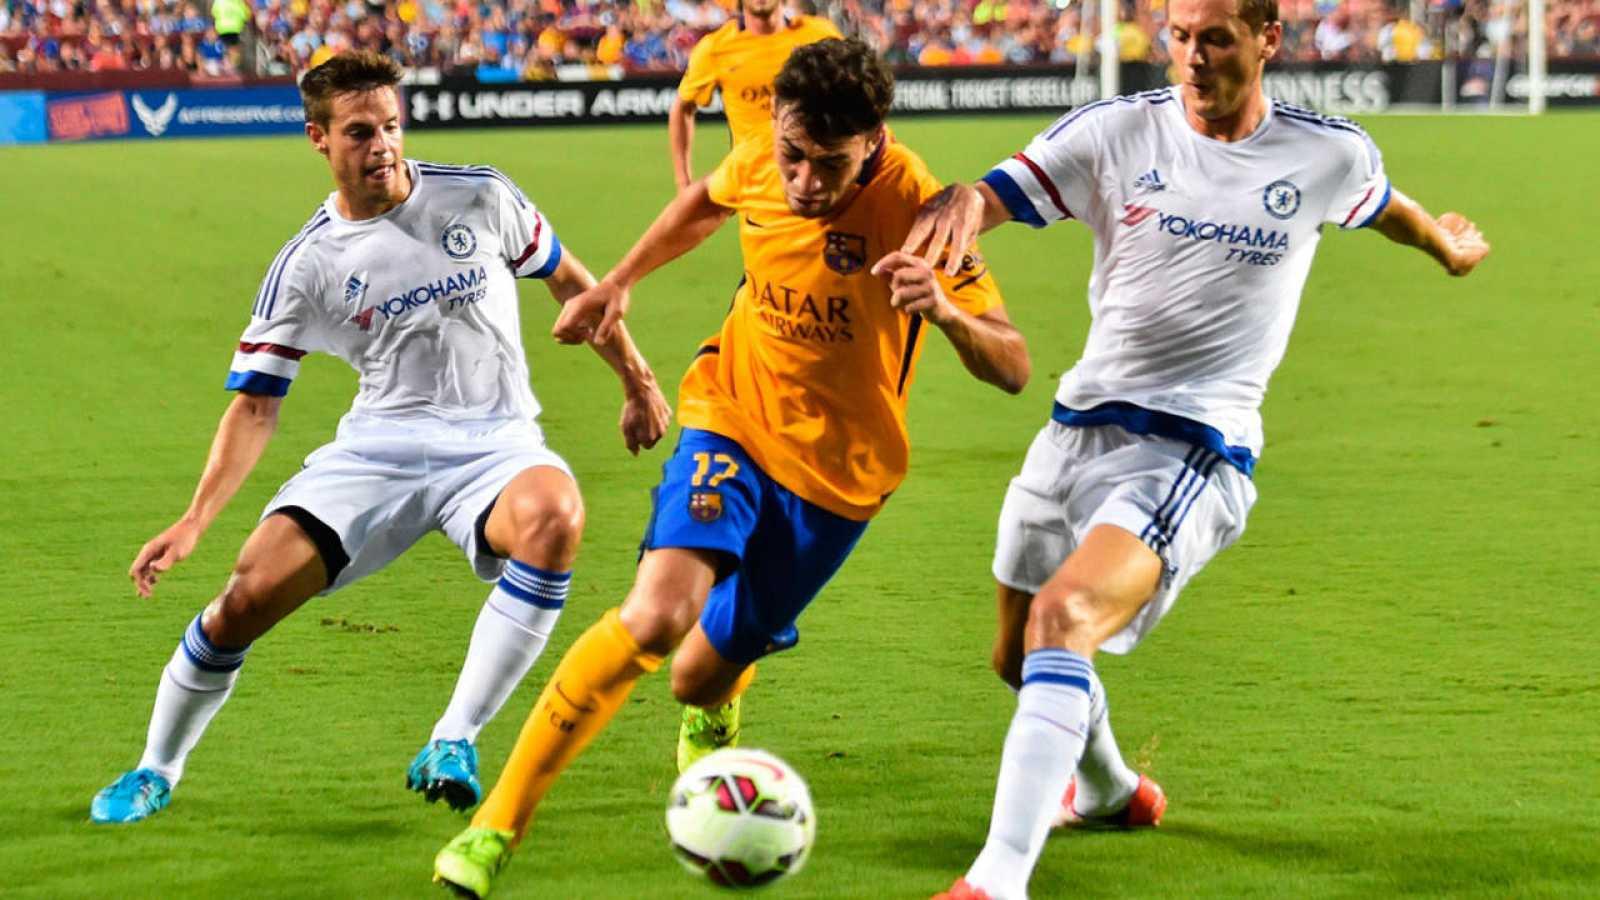 El jugador del F C Barcelona Munir disputa el balón con Azpilicueta y  Cahill a3589622bb109